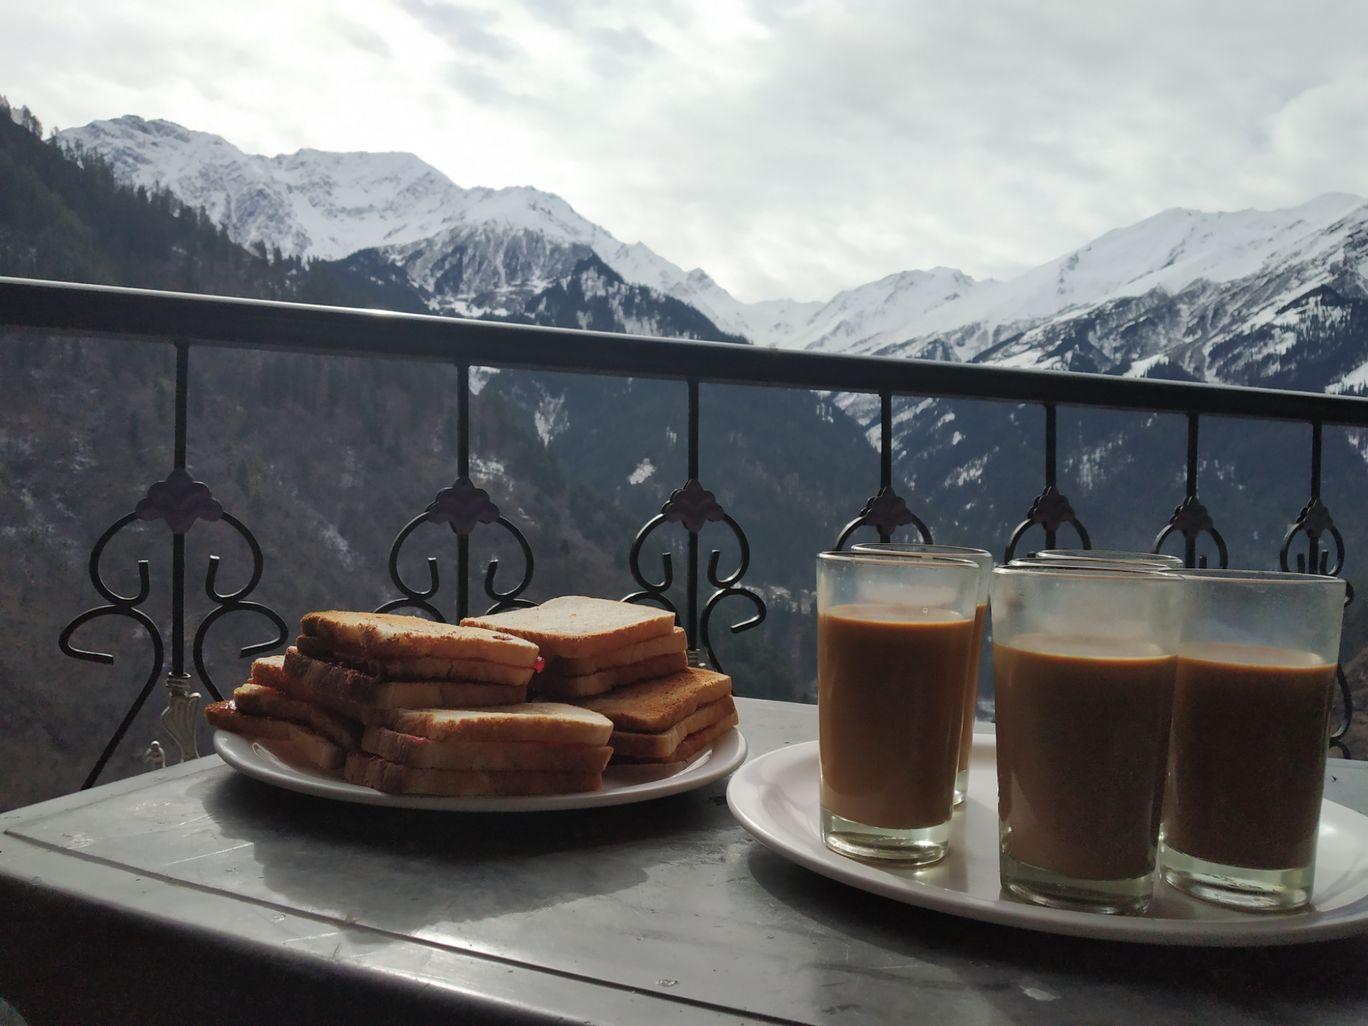 Photo of Kheerganga - Sunshine Himalayan Camp By praveen malik